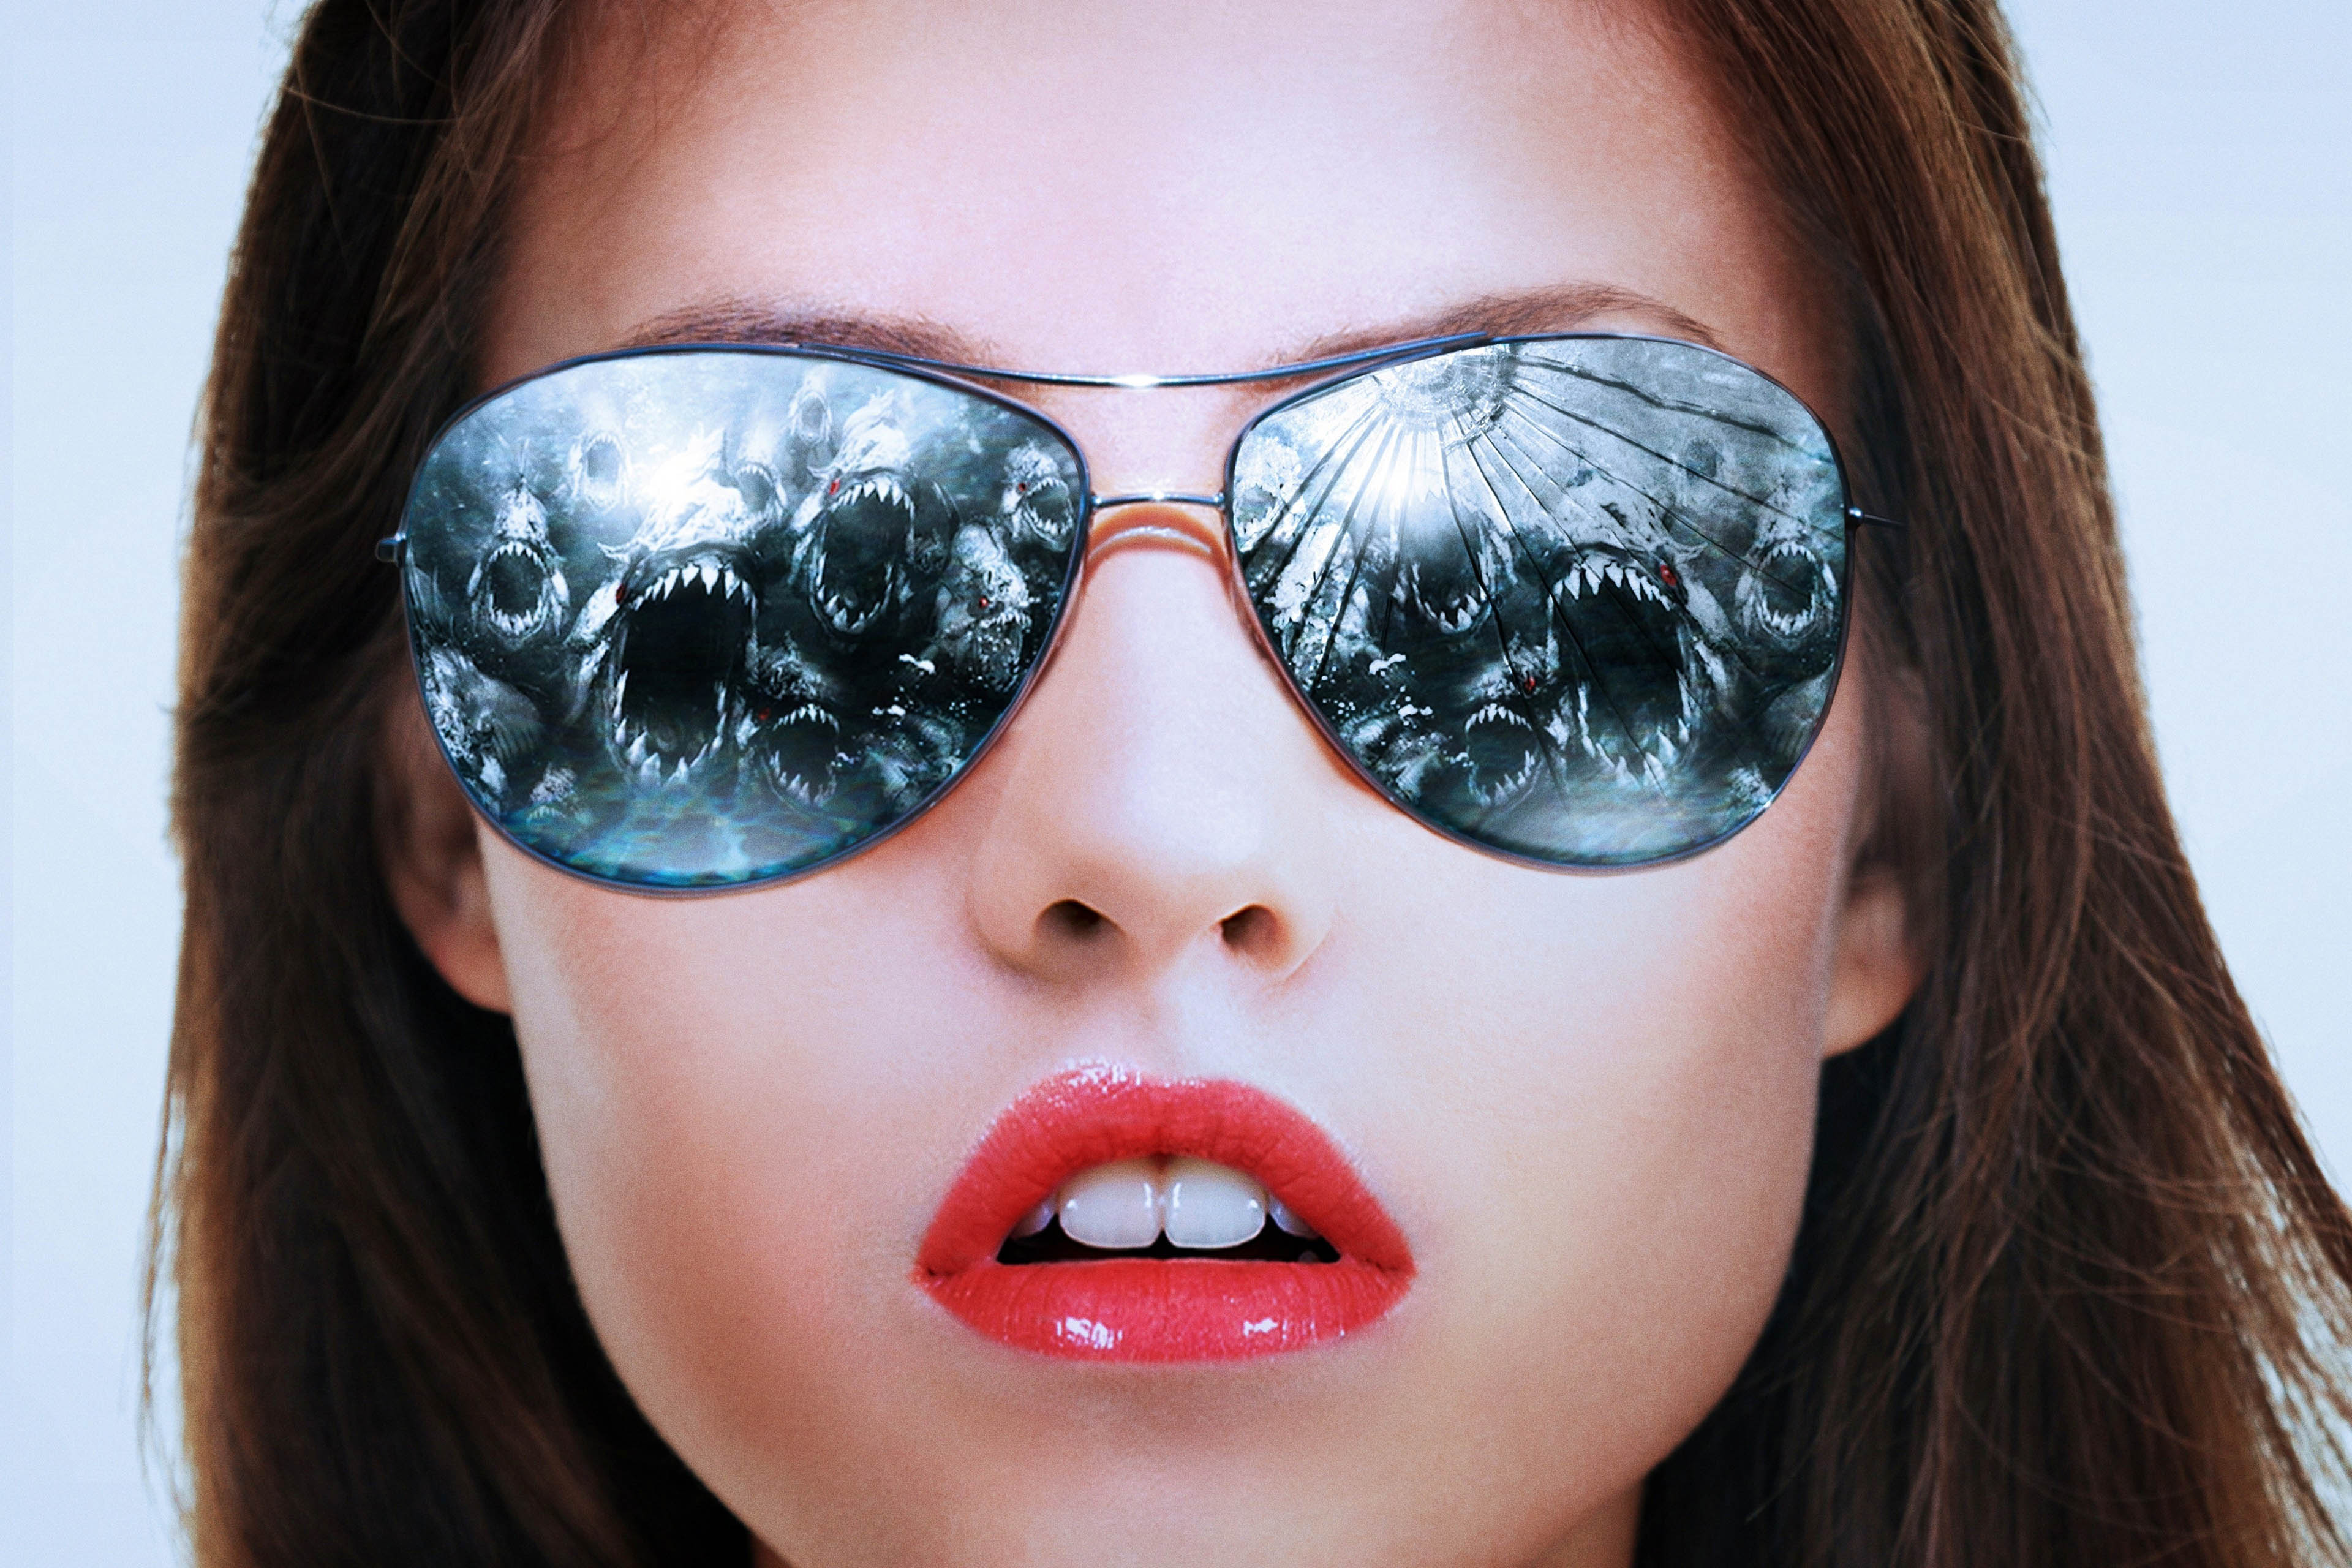 Danielle-Panabaker-Occhiali-da-sole